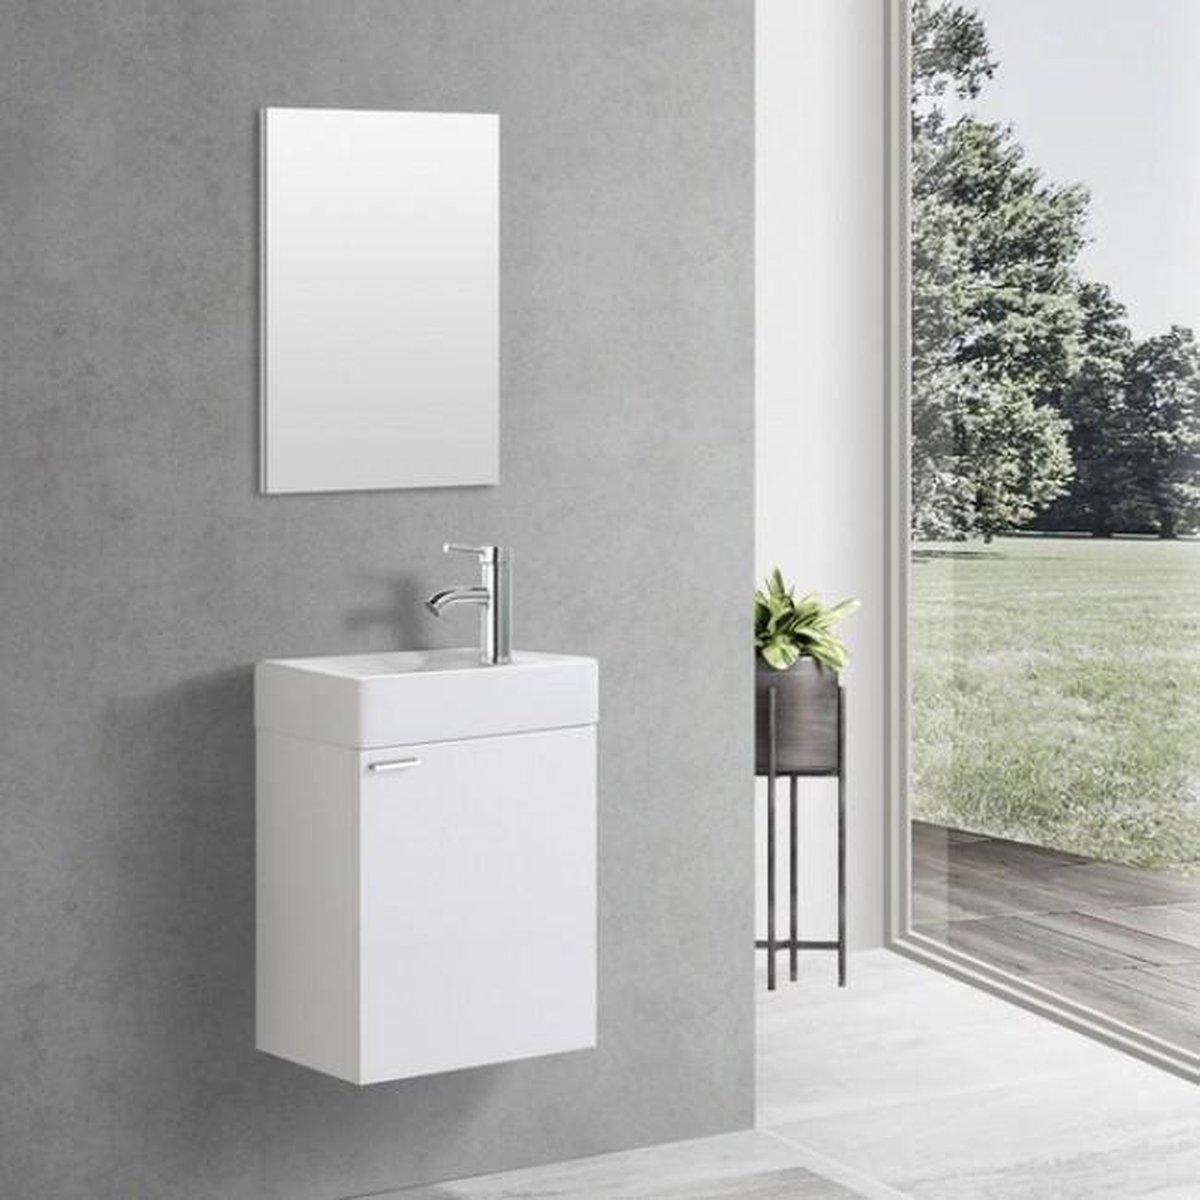 Toiletmeubel Creavit Aloni Hangend Rechtsdraaiend 40x60x22cm MDF Glans Wit Softclose Keramiek Wasbak